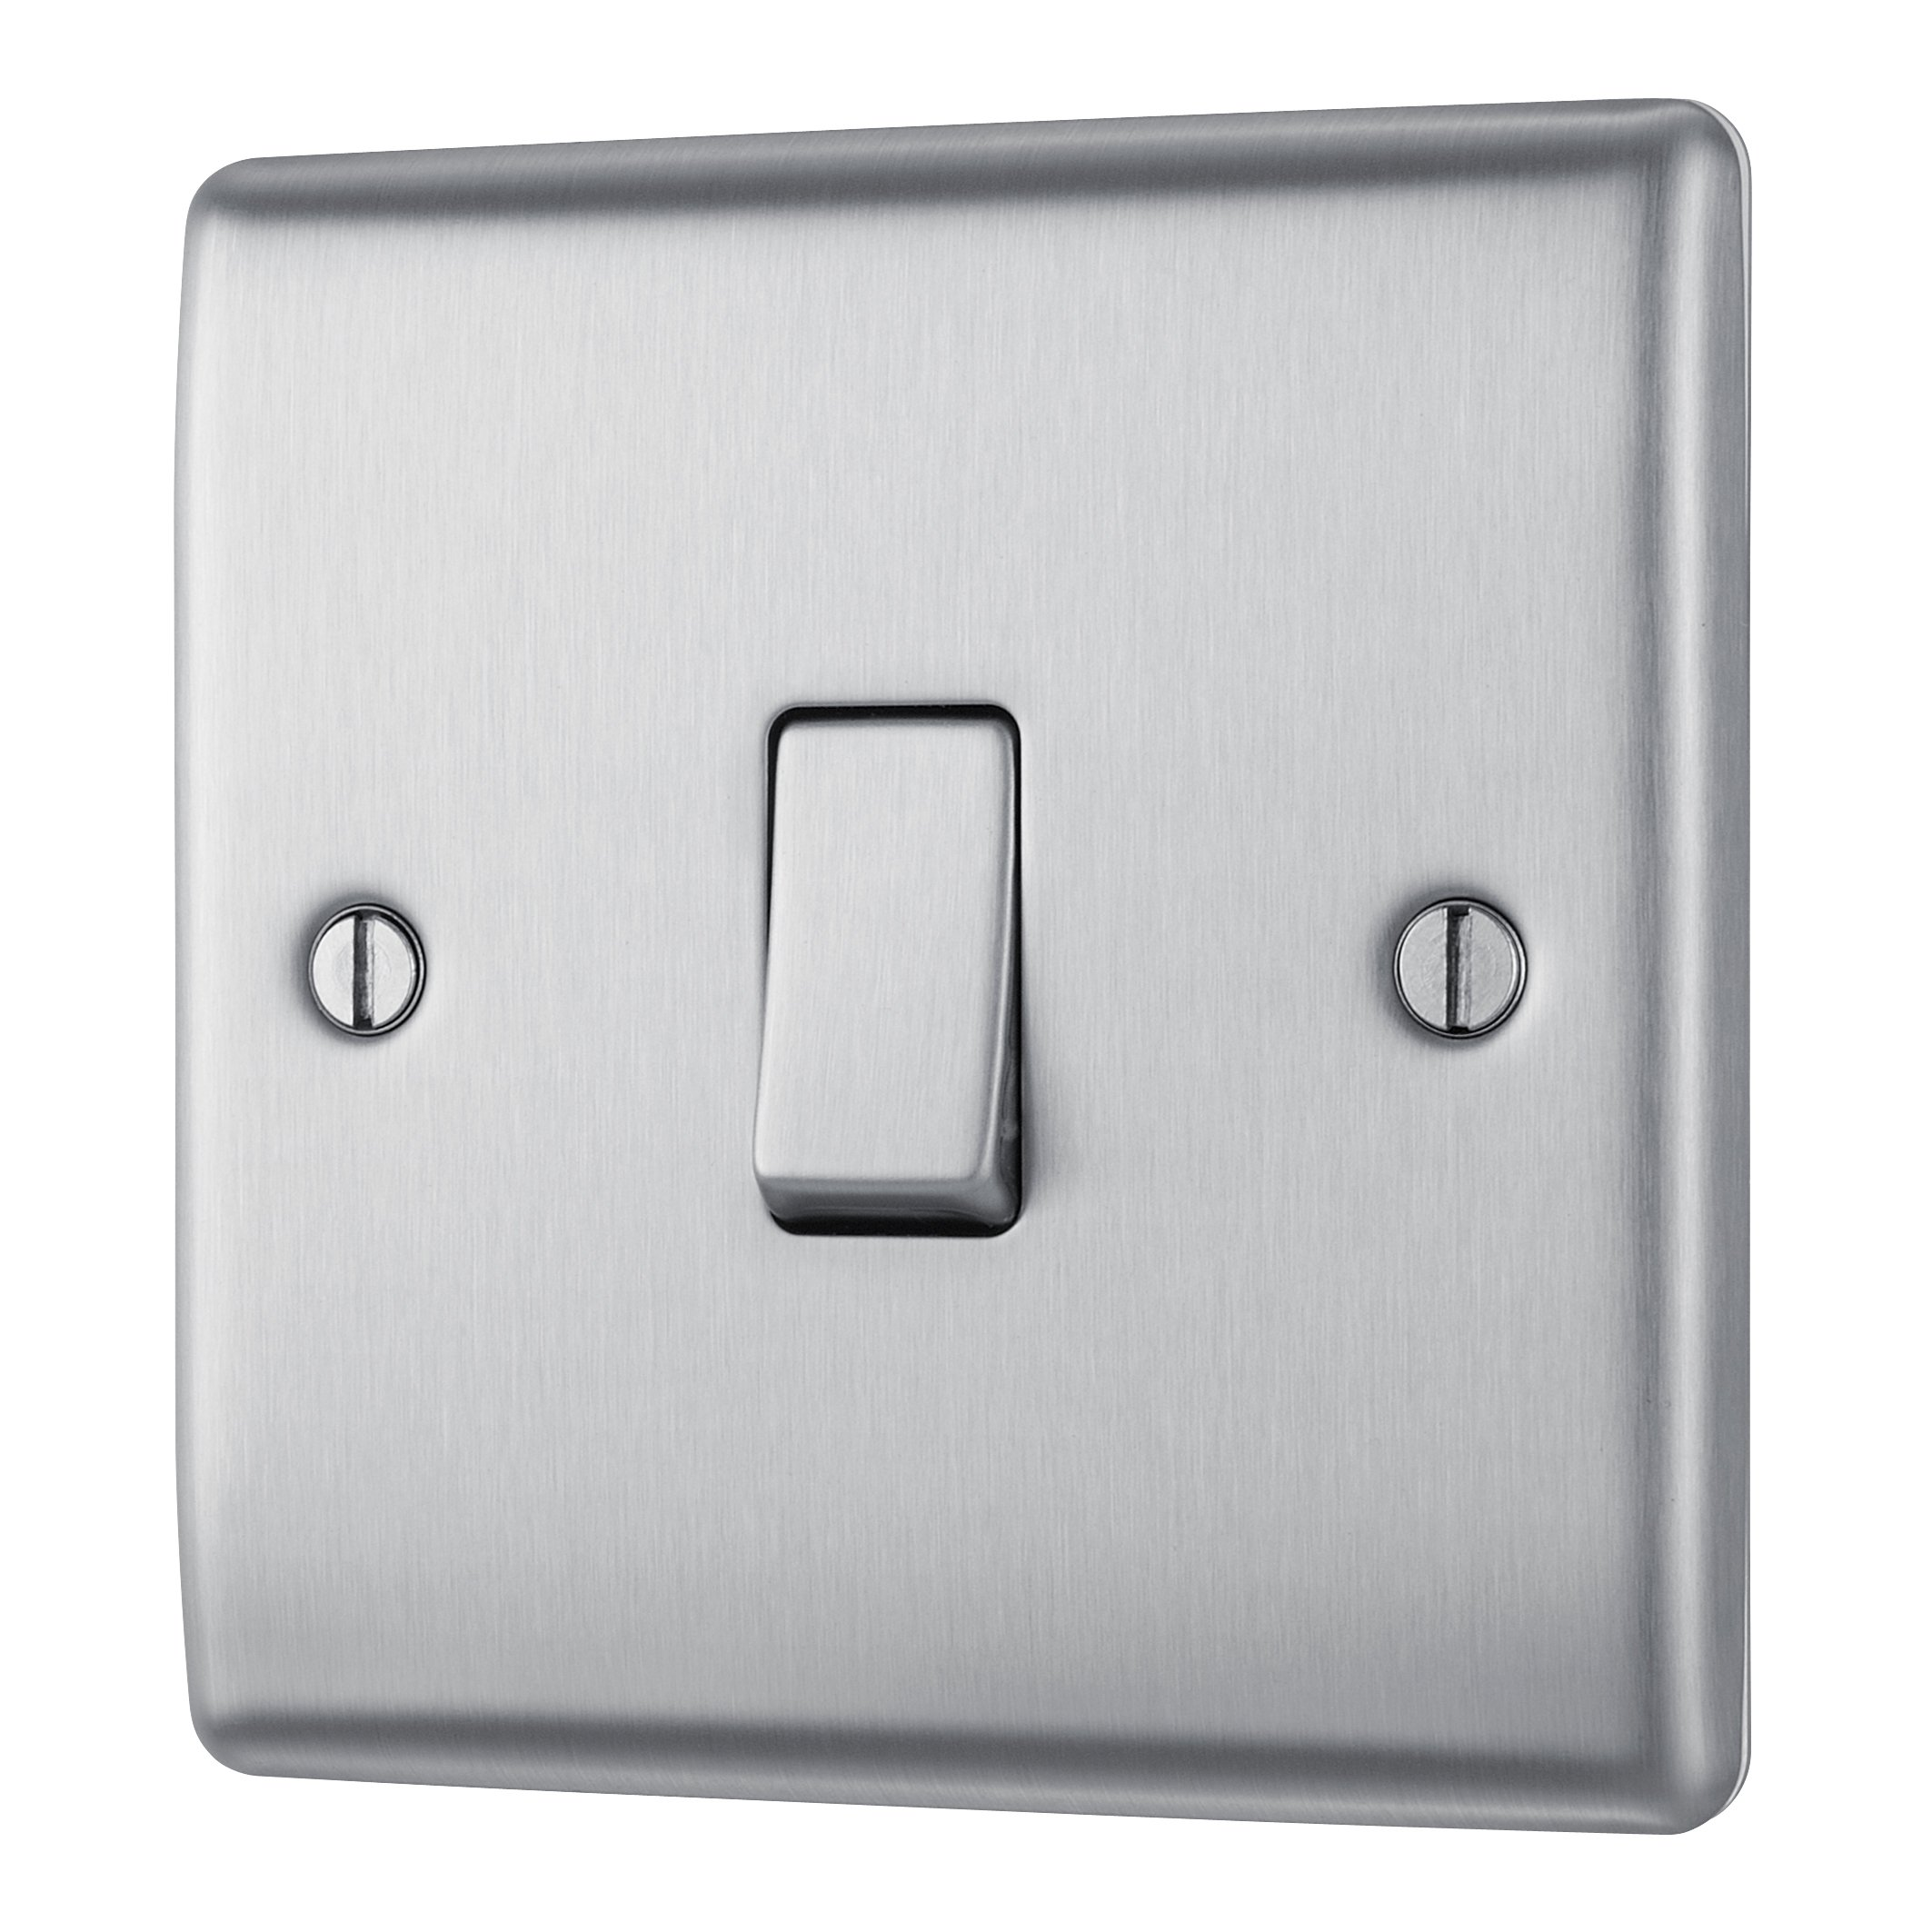 Intermediate Light Switches: Amazon.co.uk